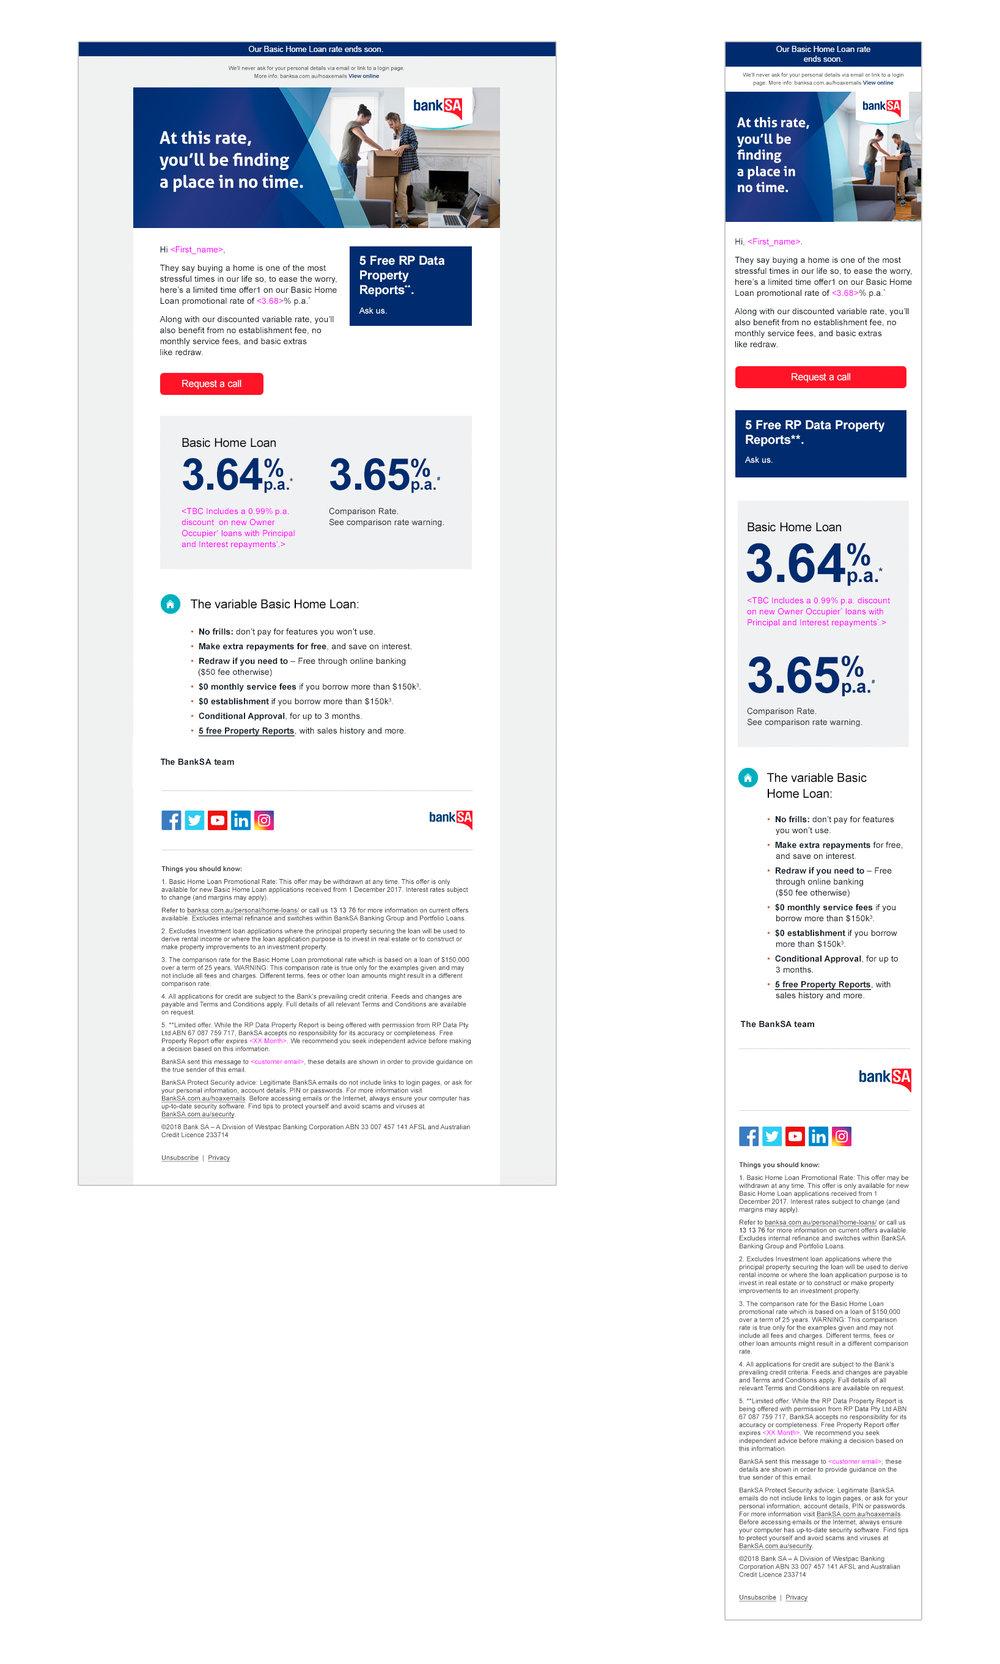 Multibrand_BankSA_02.jpg